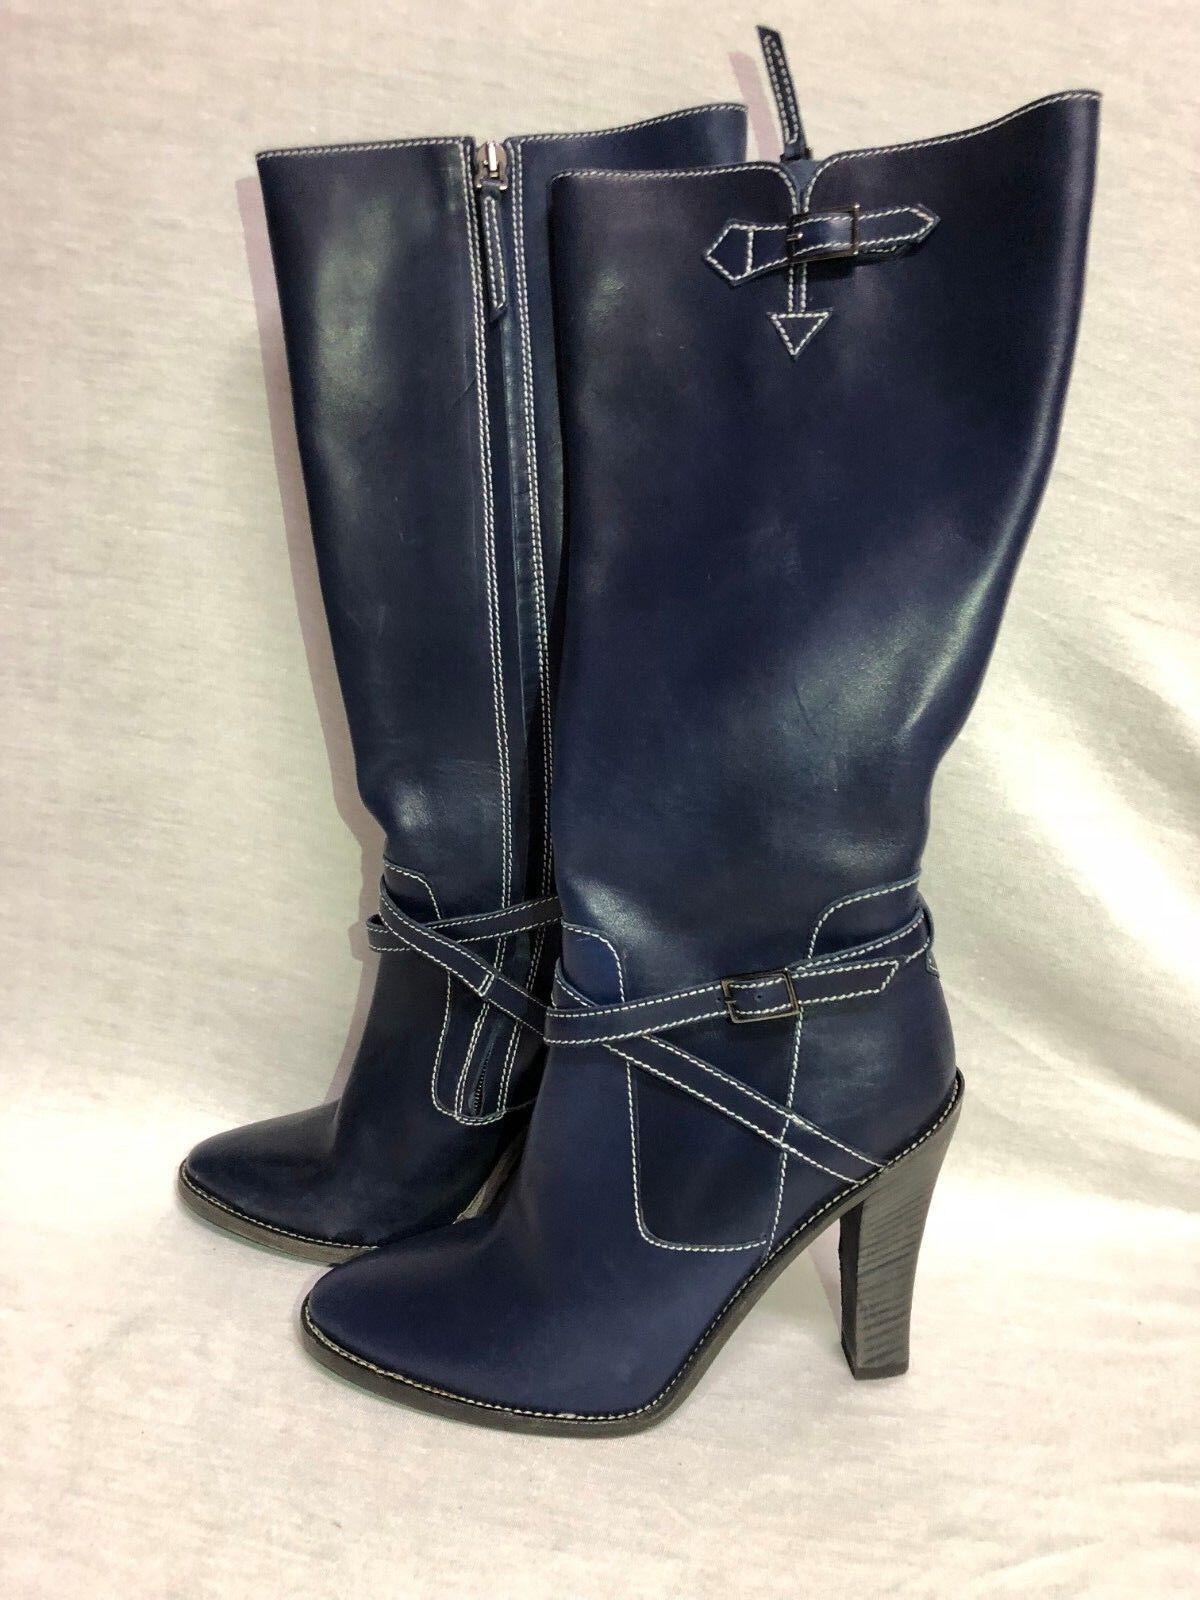 BCBG MAXAZRIA  chaussures Tall bottes Faux Leather Navy bleu zipper   Taille  8B   38.5